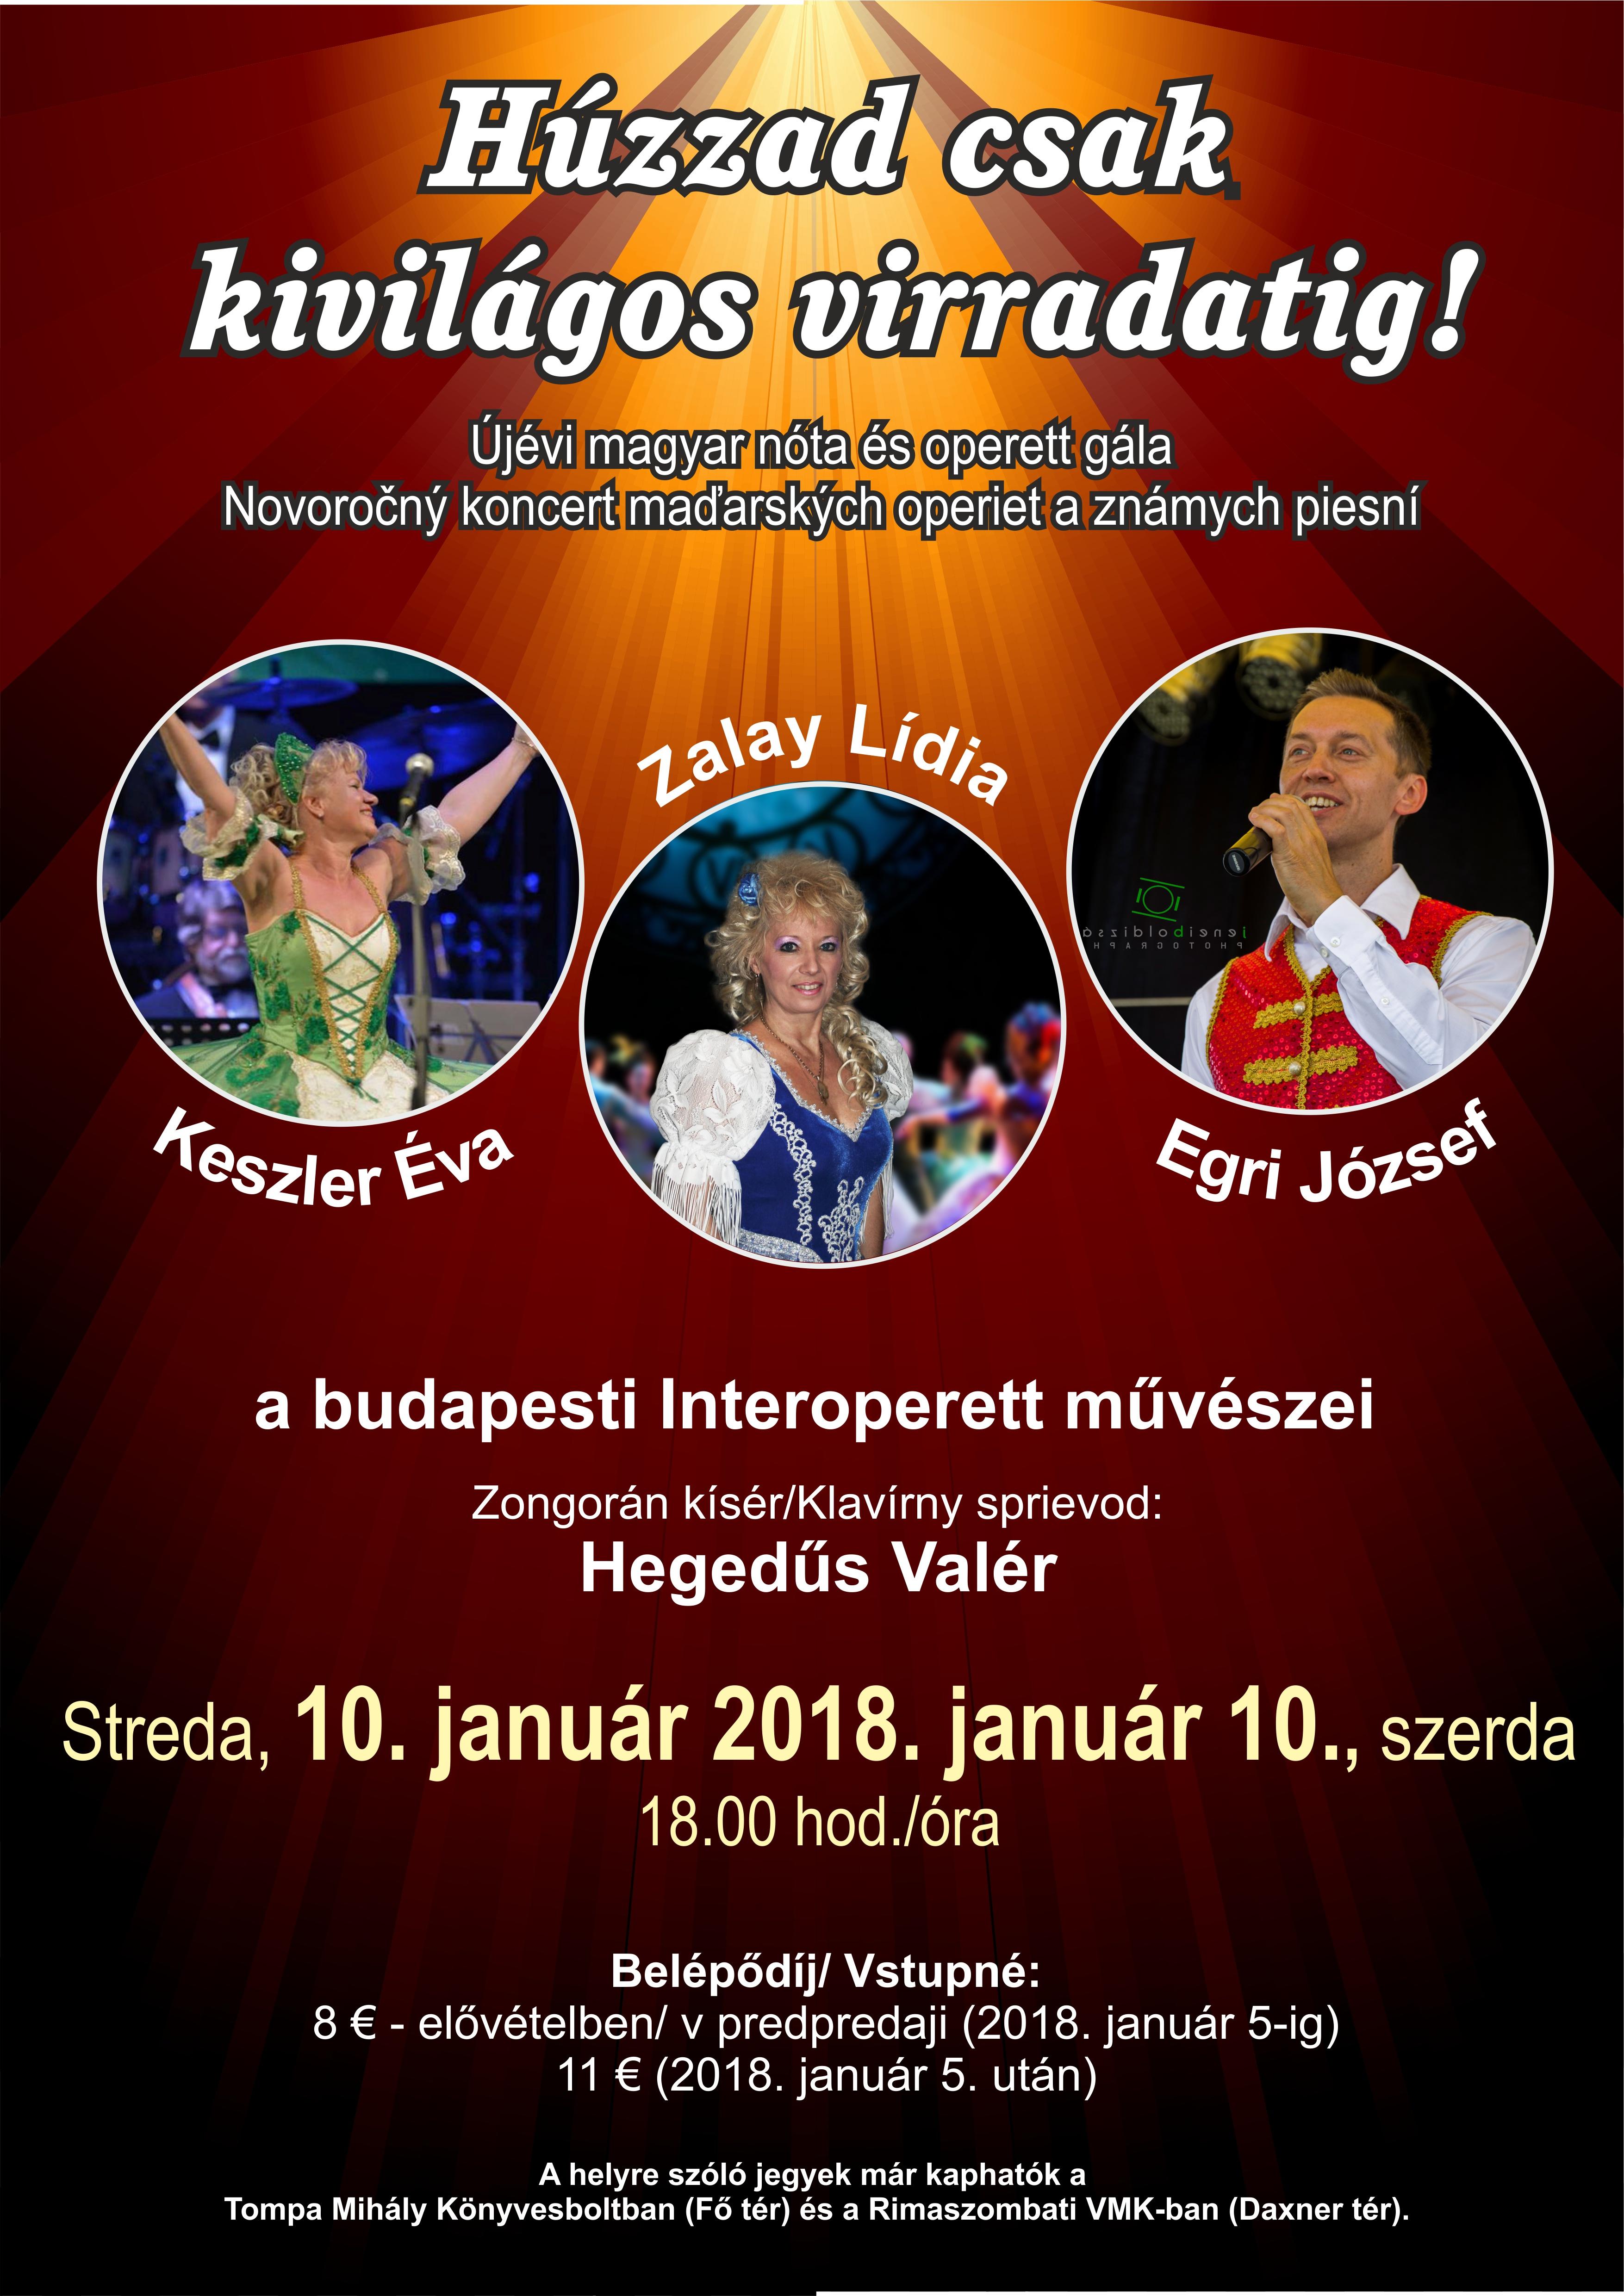 Újévi magyar nóta és operett gála - Novoročný koncert maďarských operiet @ divadelná sála DK | Banskobystrický kraj | Slovensko